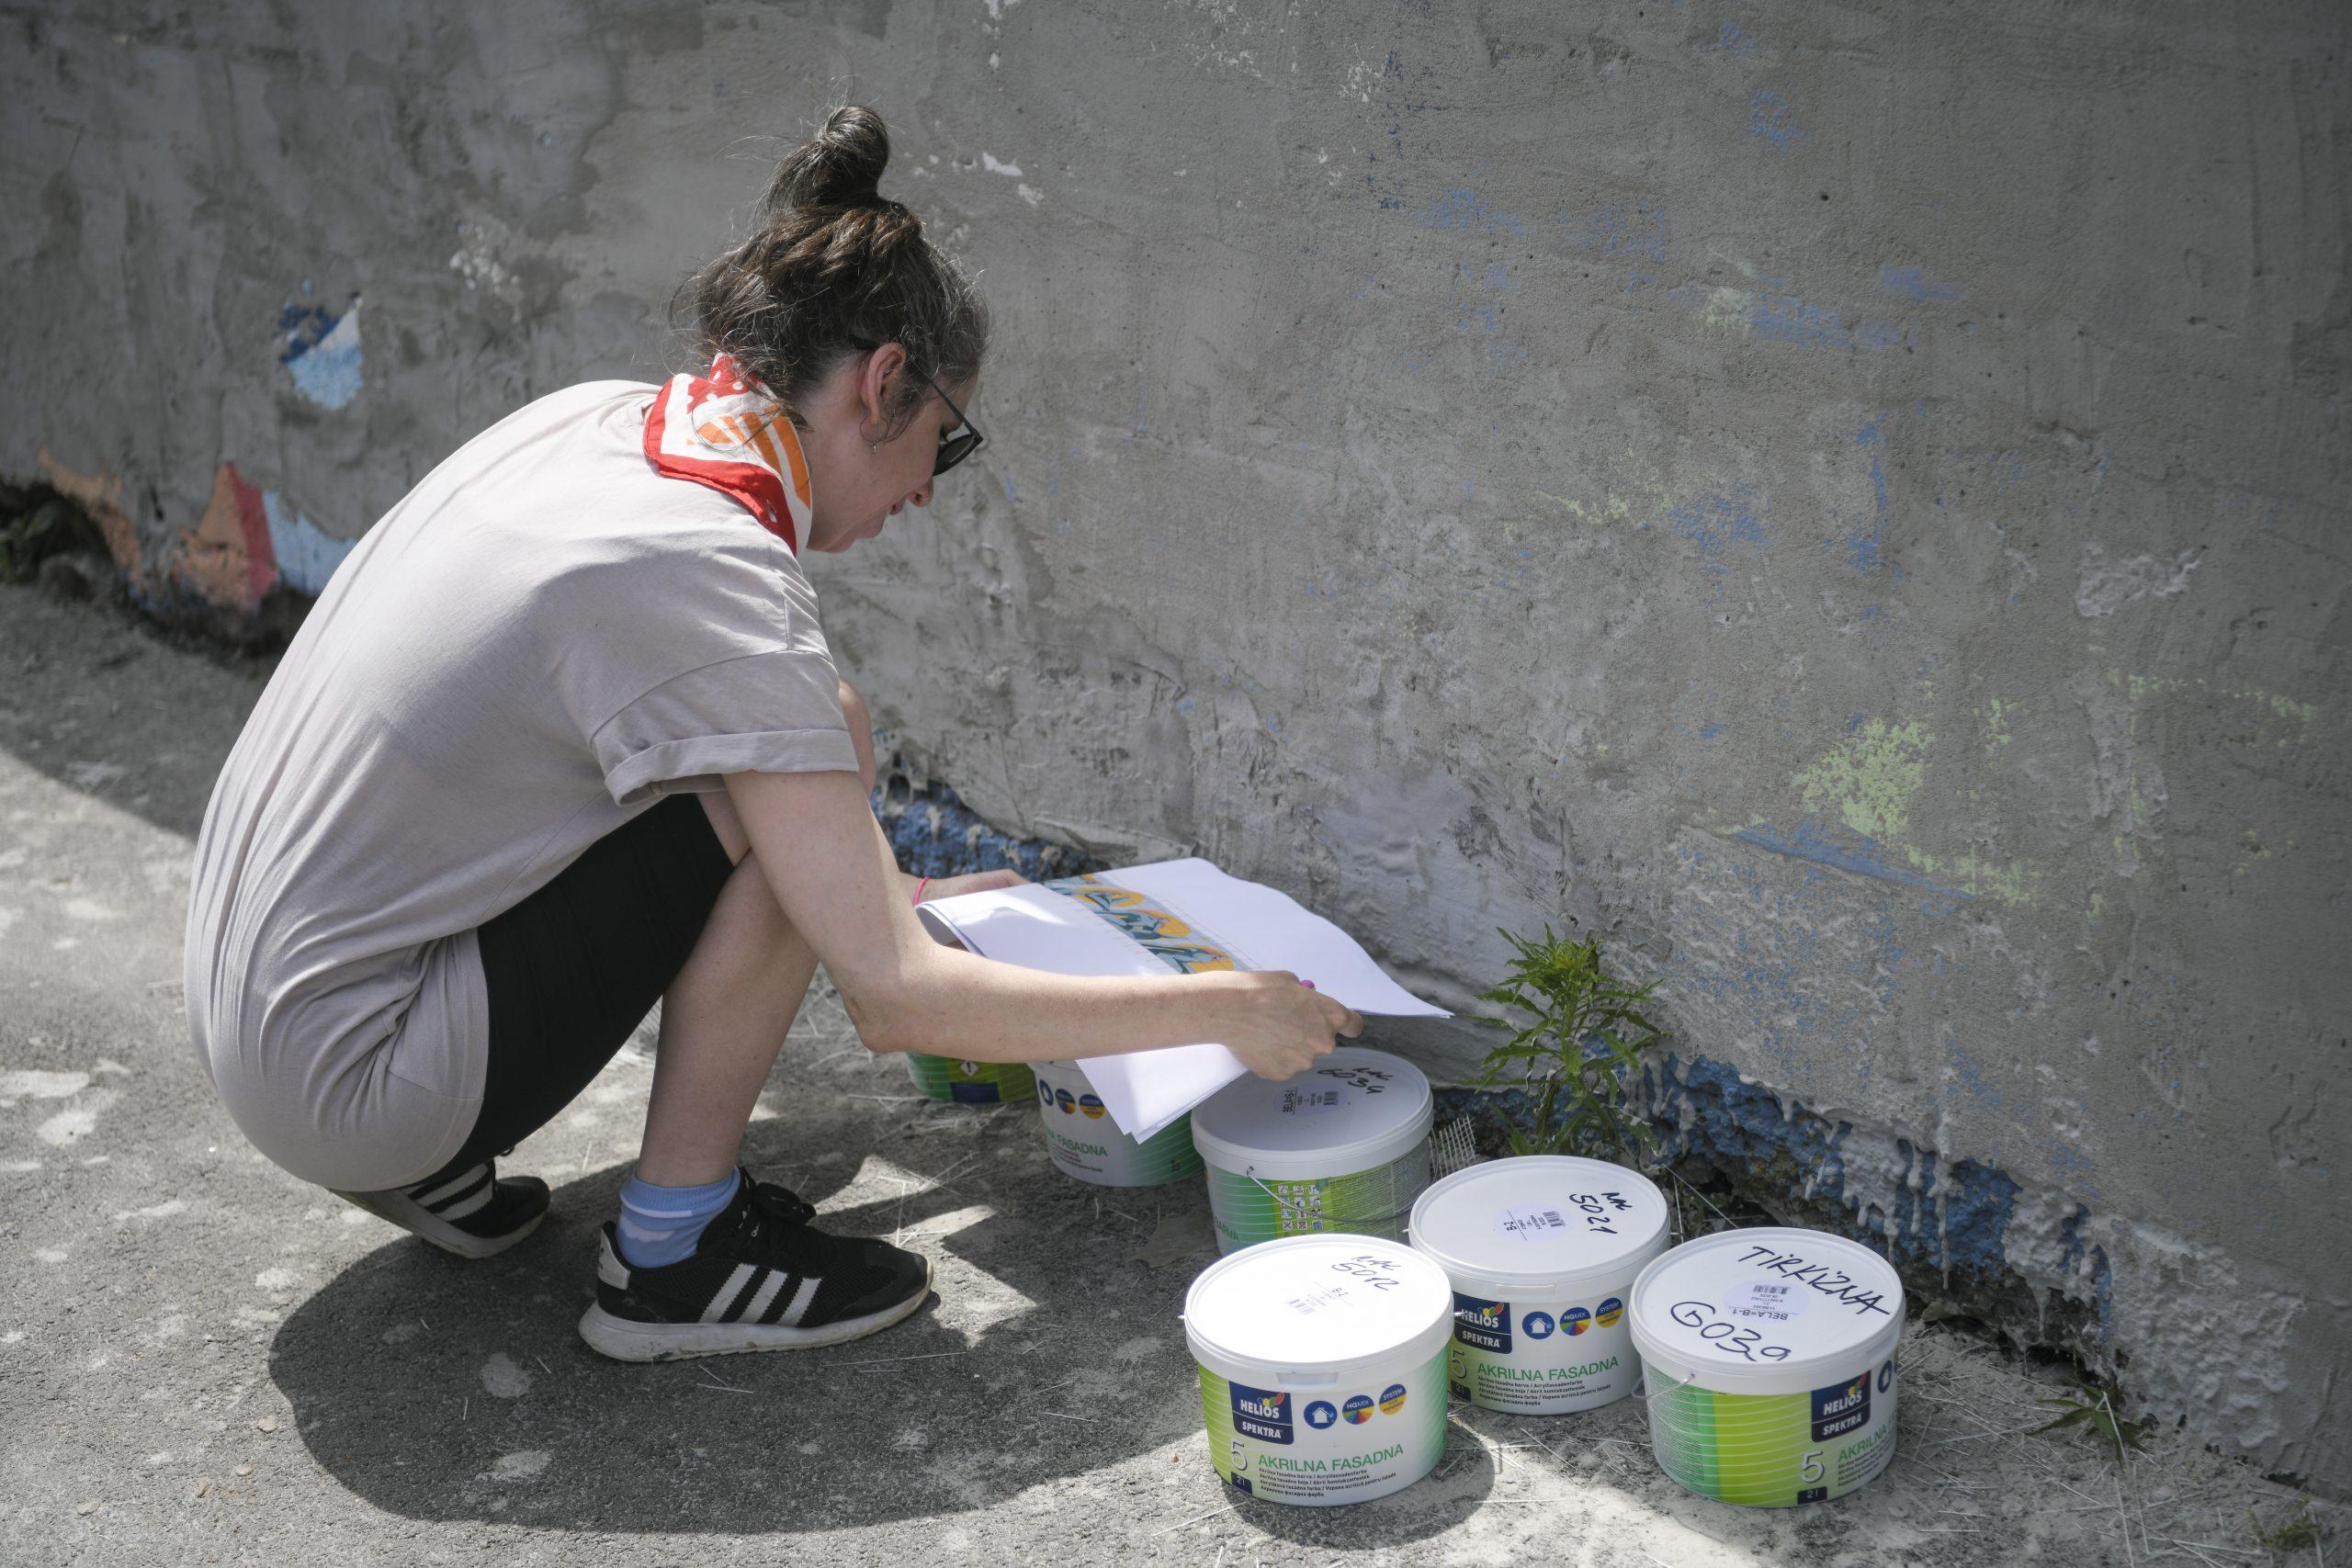 Dorćol plac, Dorćol platz, All Girls Street Jam, oslikavanje zidova, mural, murali, umetnici